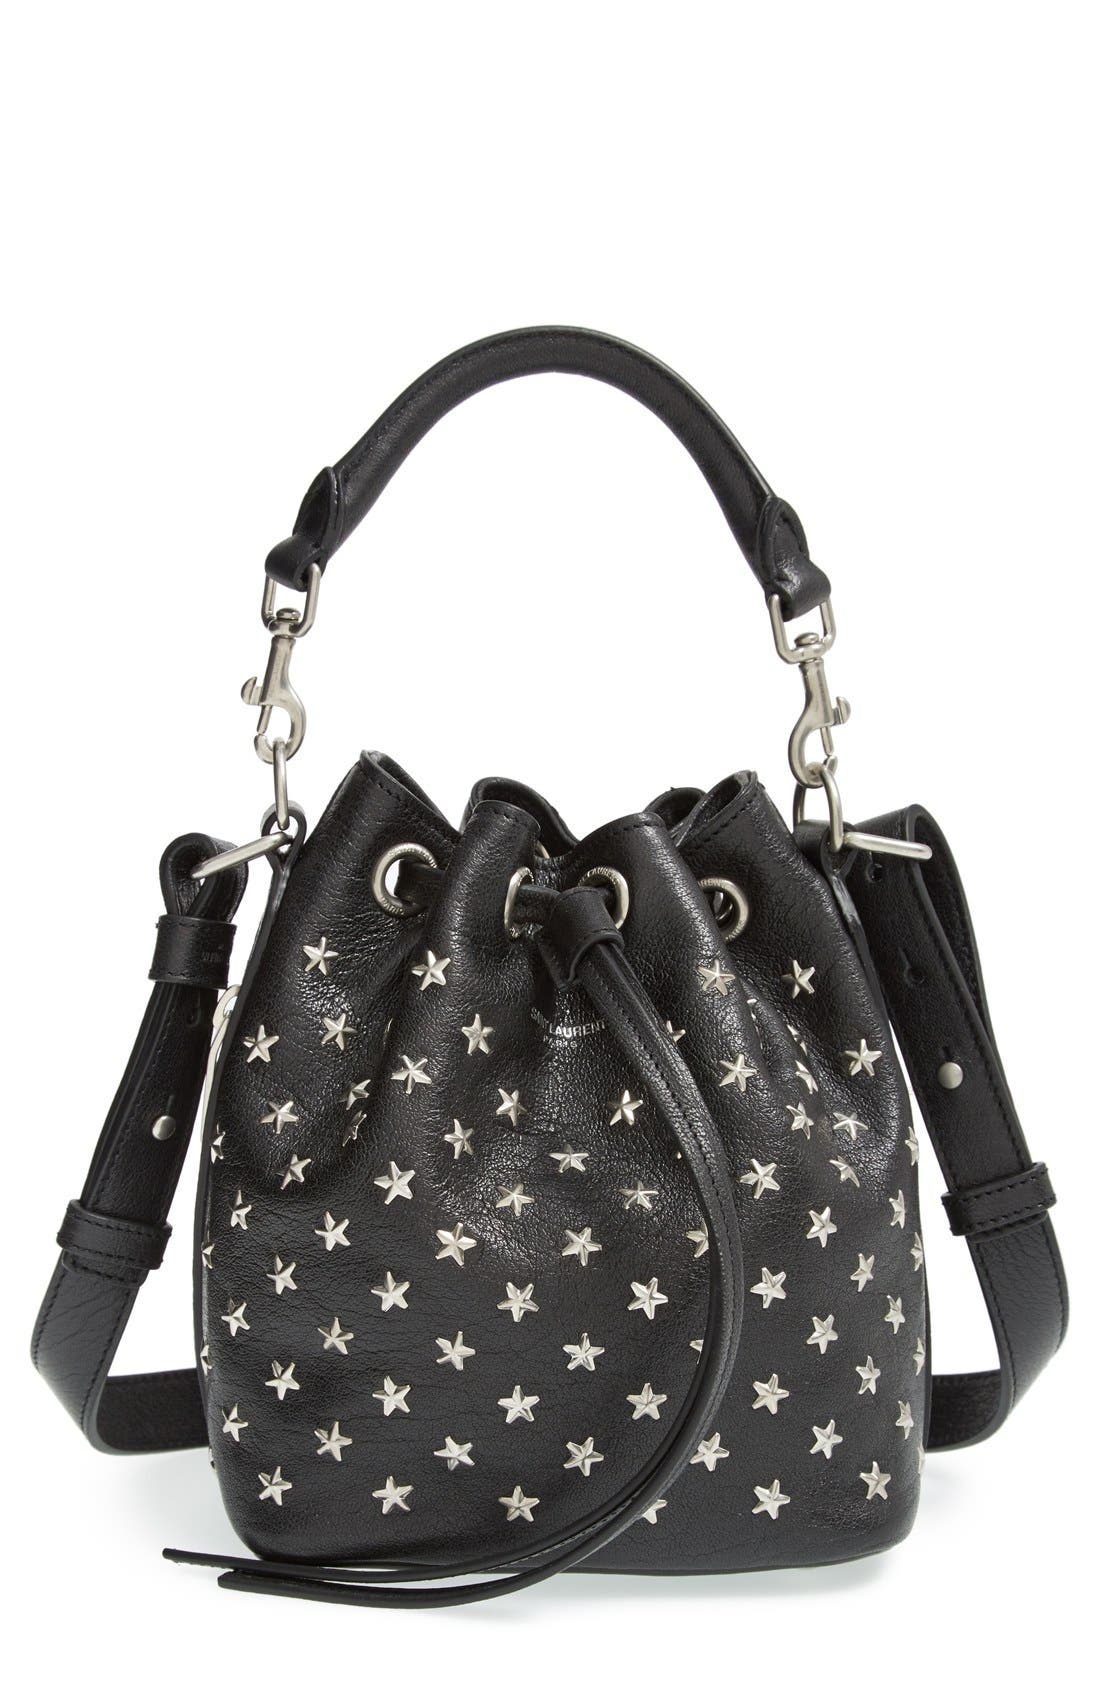 Alternate Image 1 Selected - Saint Laurent Studded Small Leather Bucket Bag